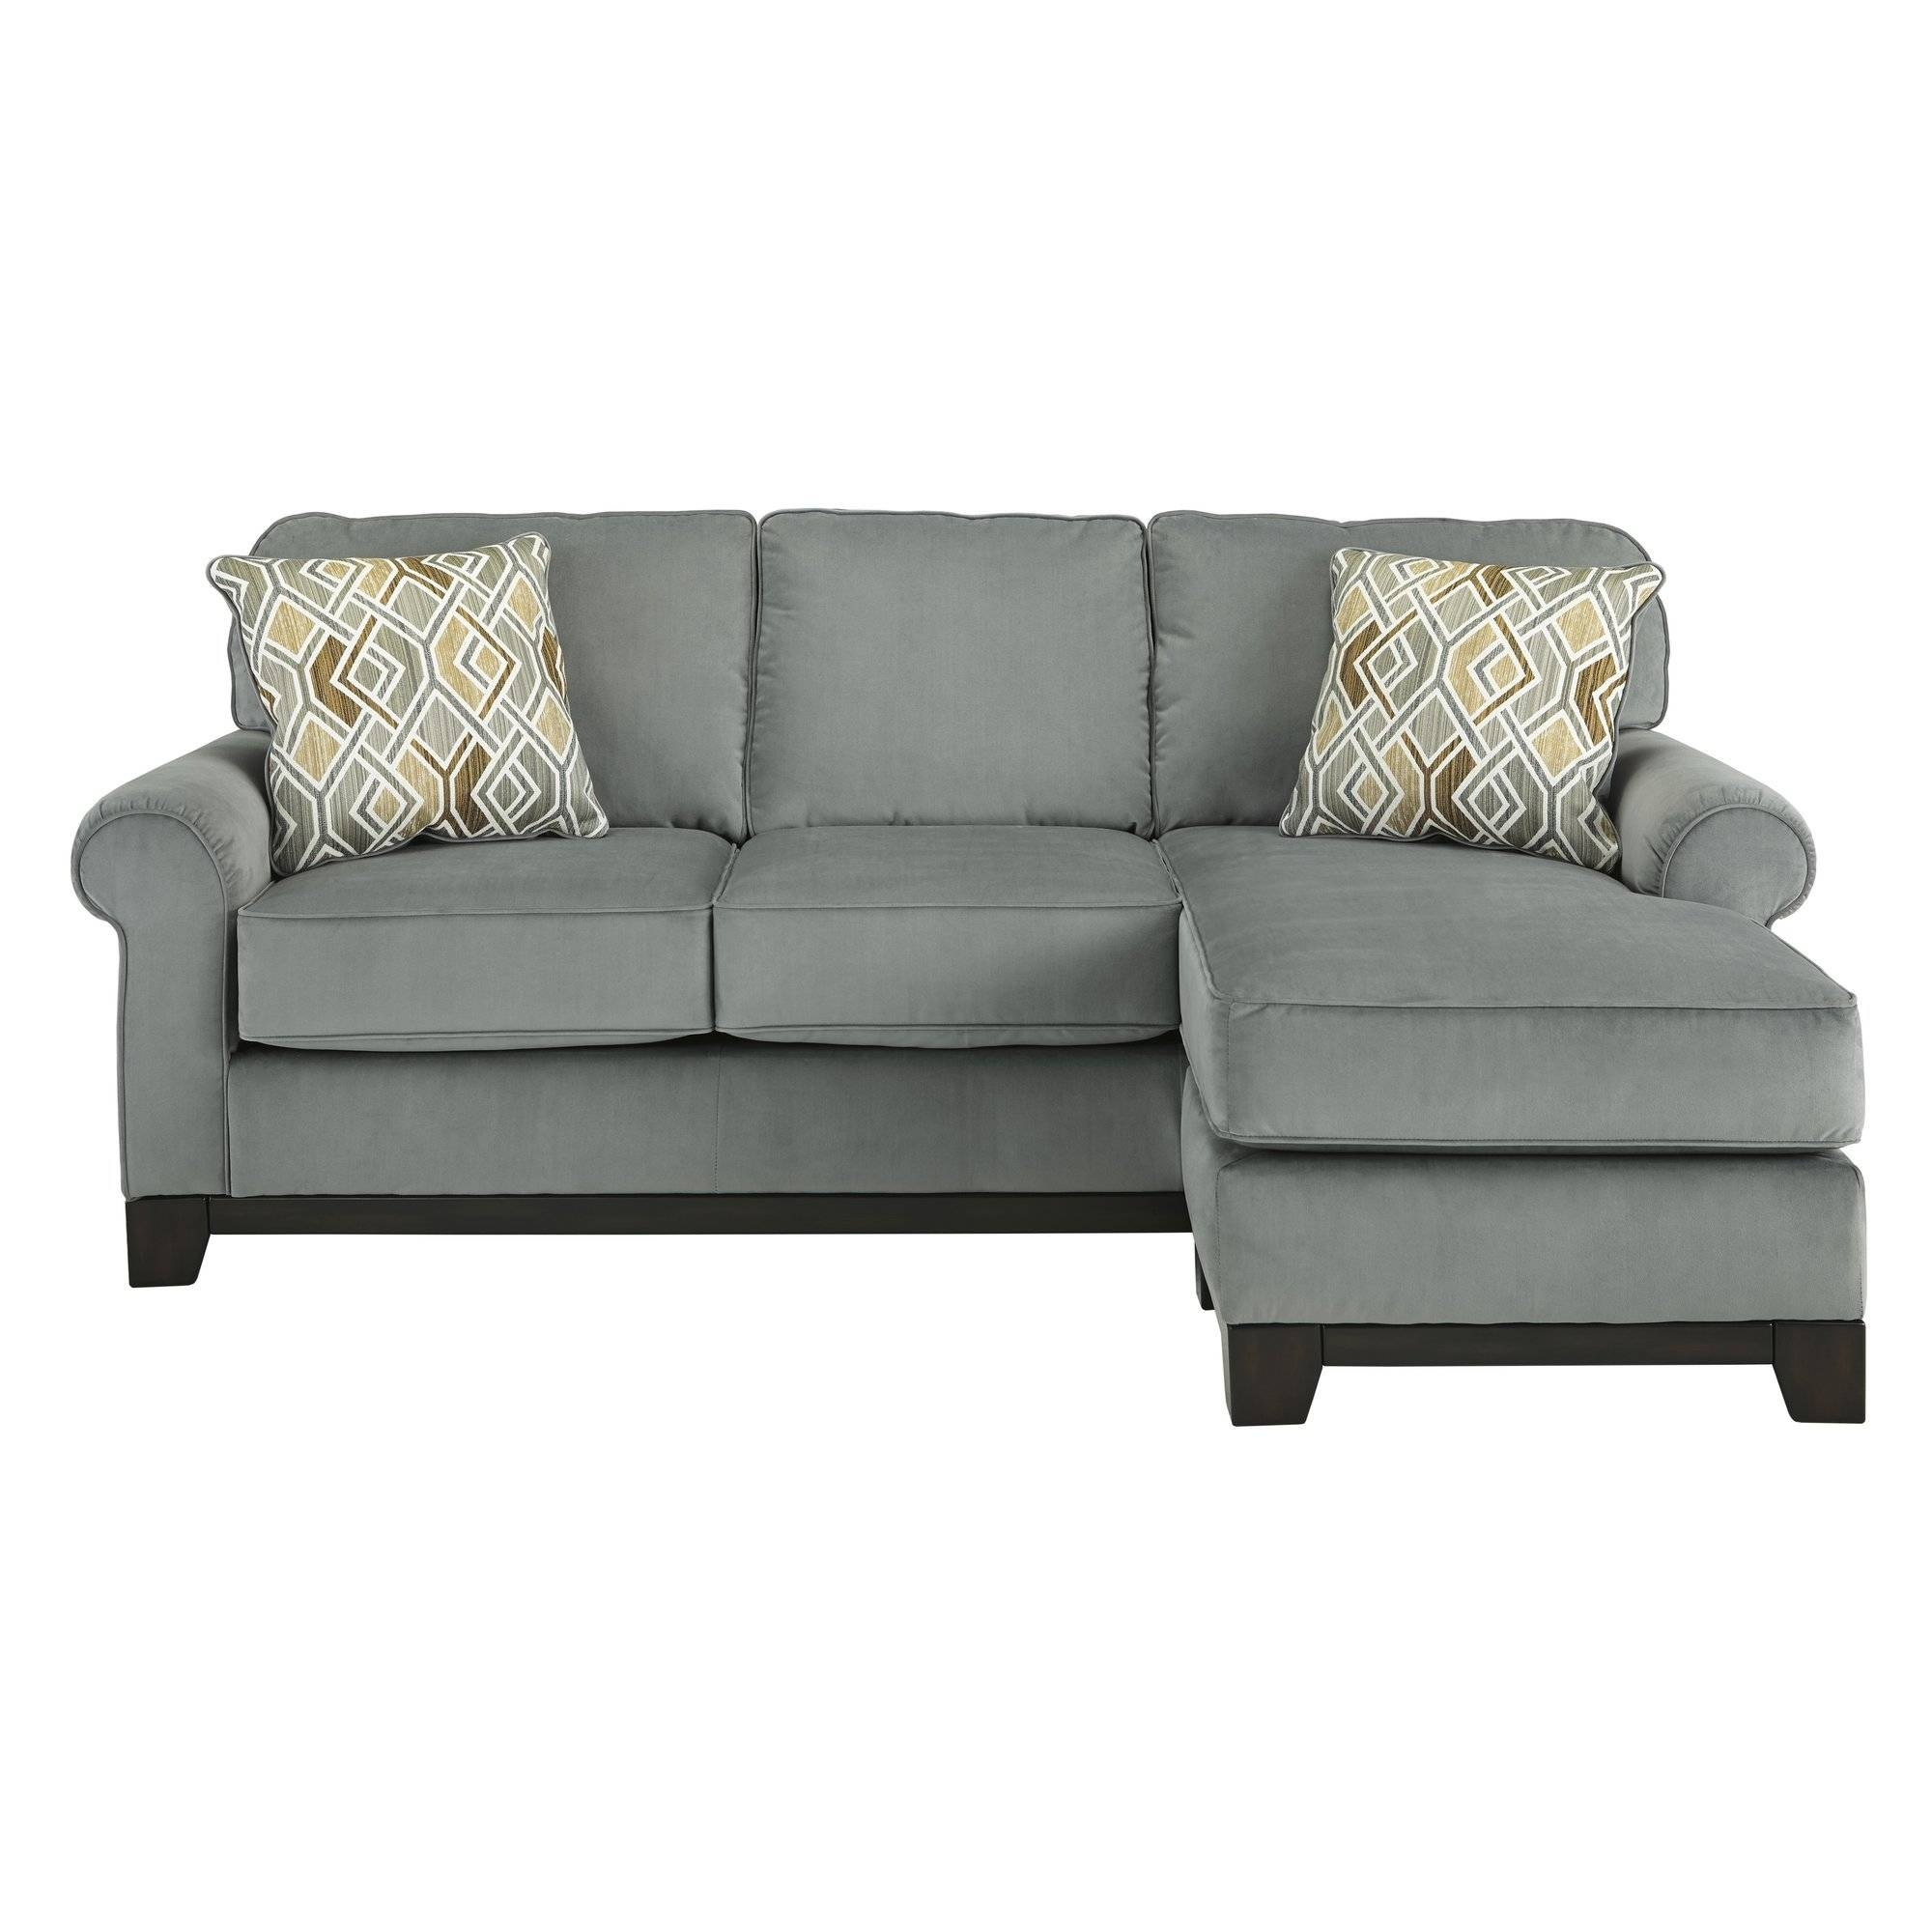 70s sofa sofas chestnut street edinburgh 70 sleeper energywarden